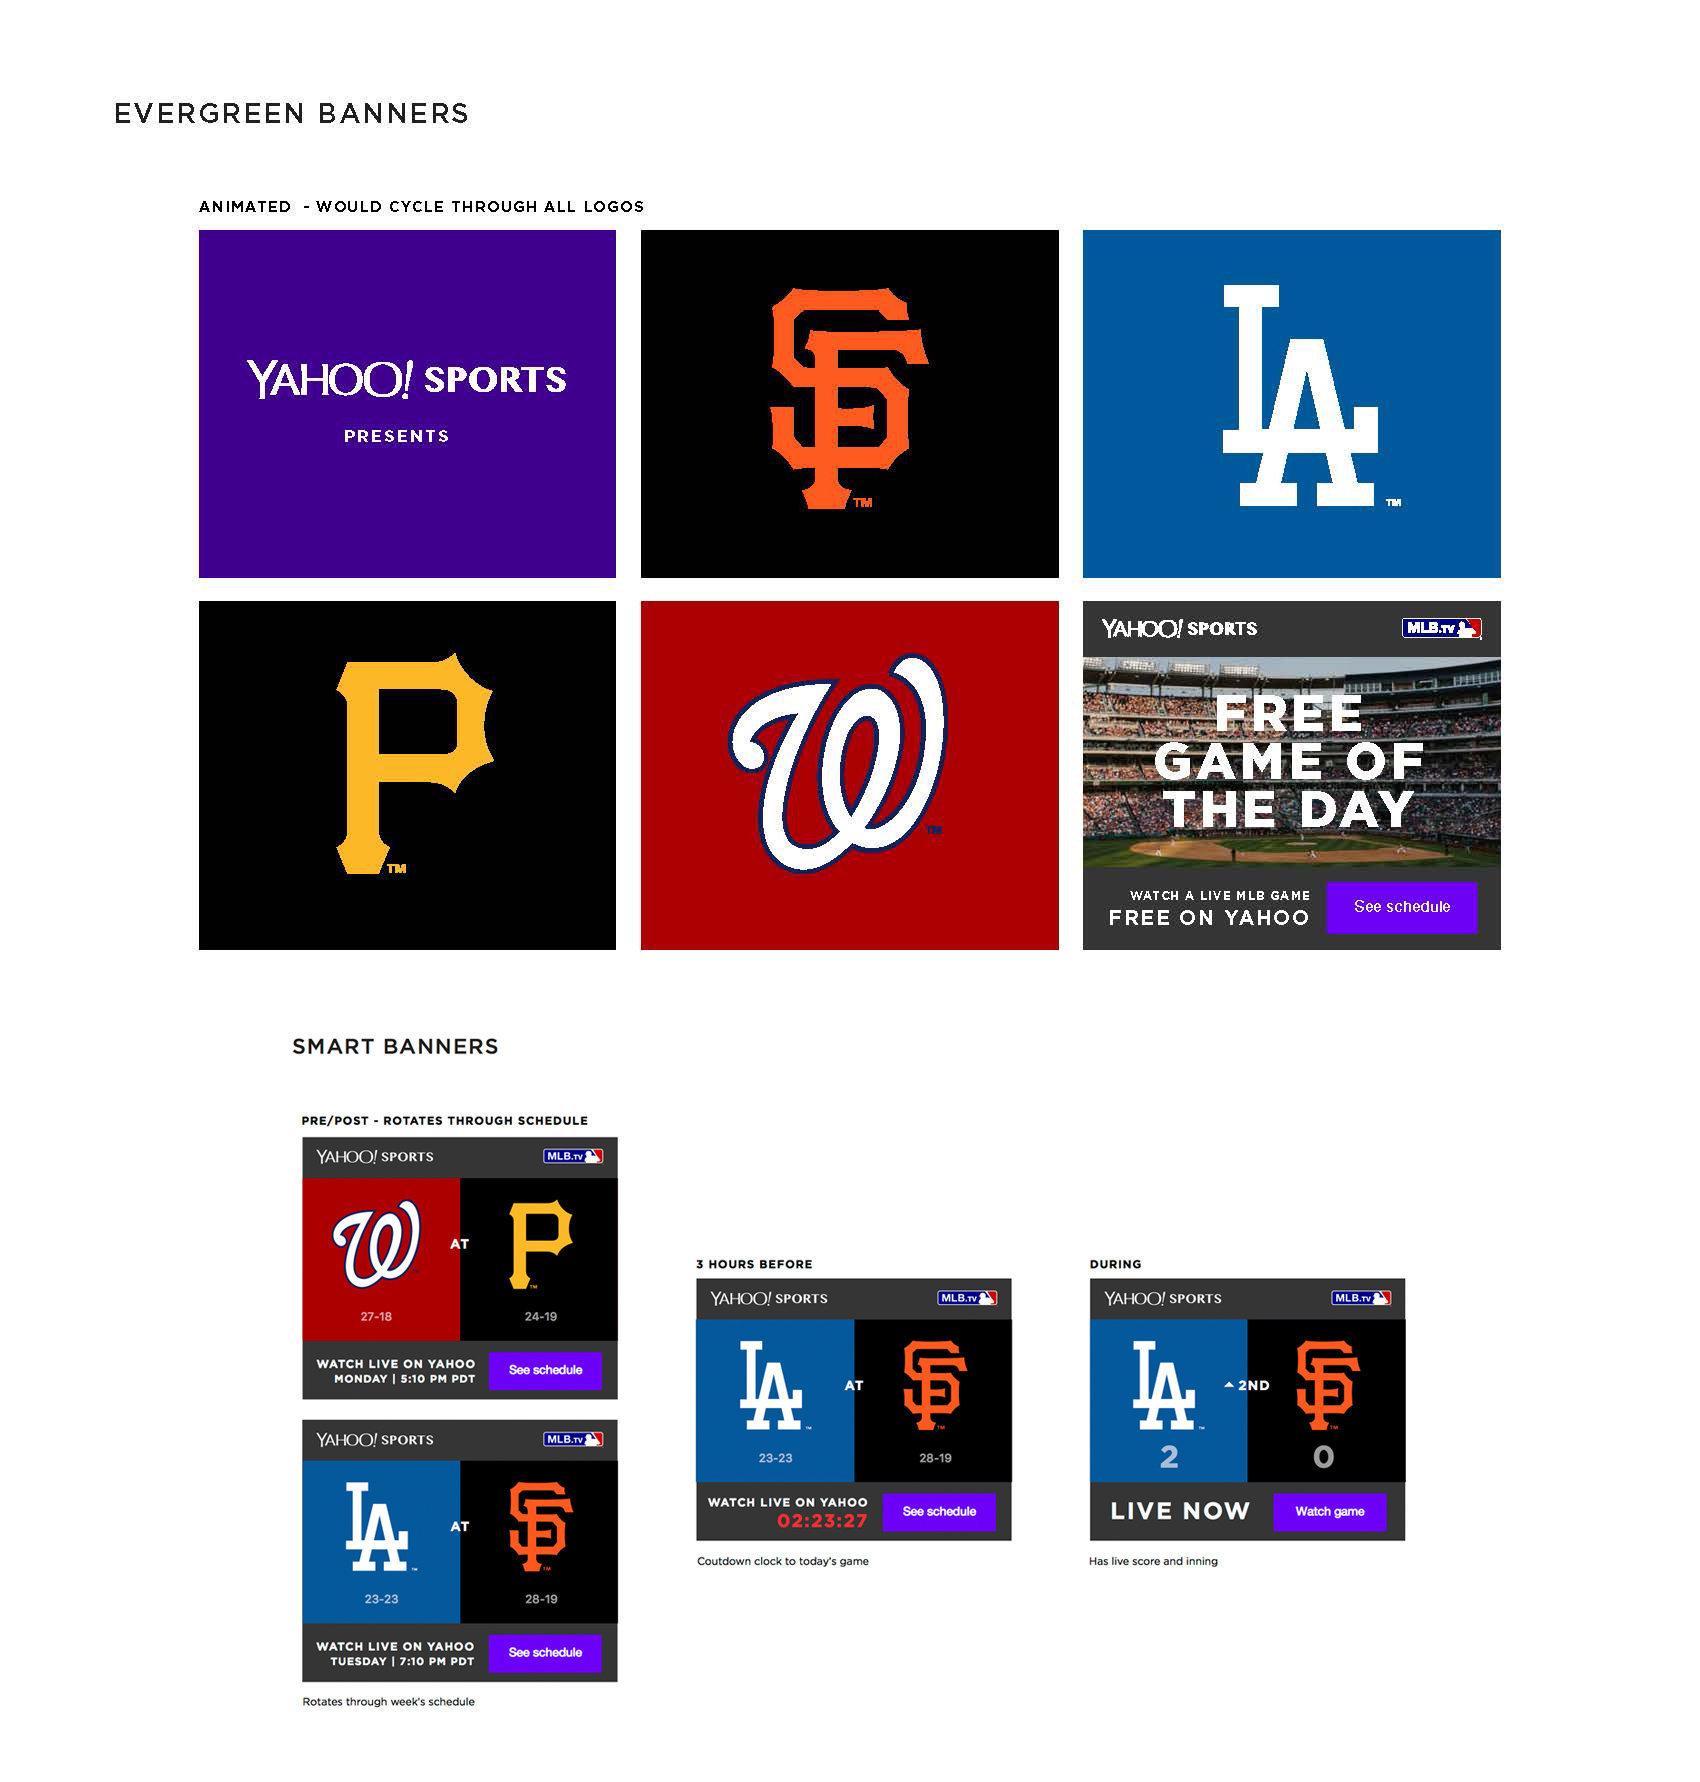 Yahoo! MLB GOTD / Banners